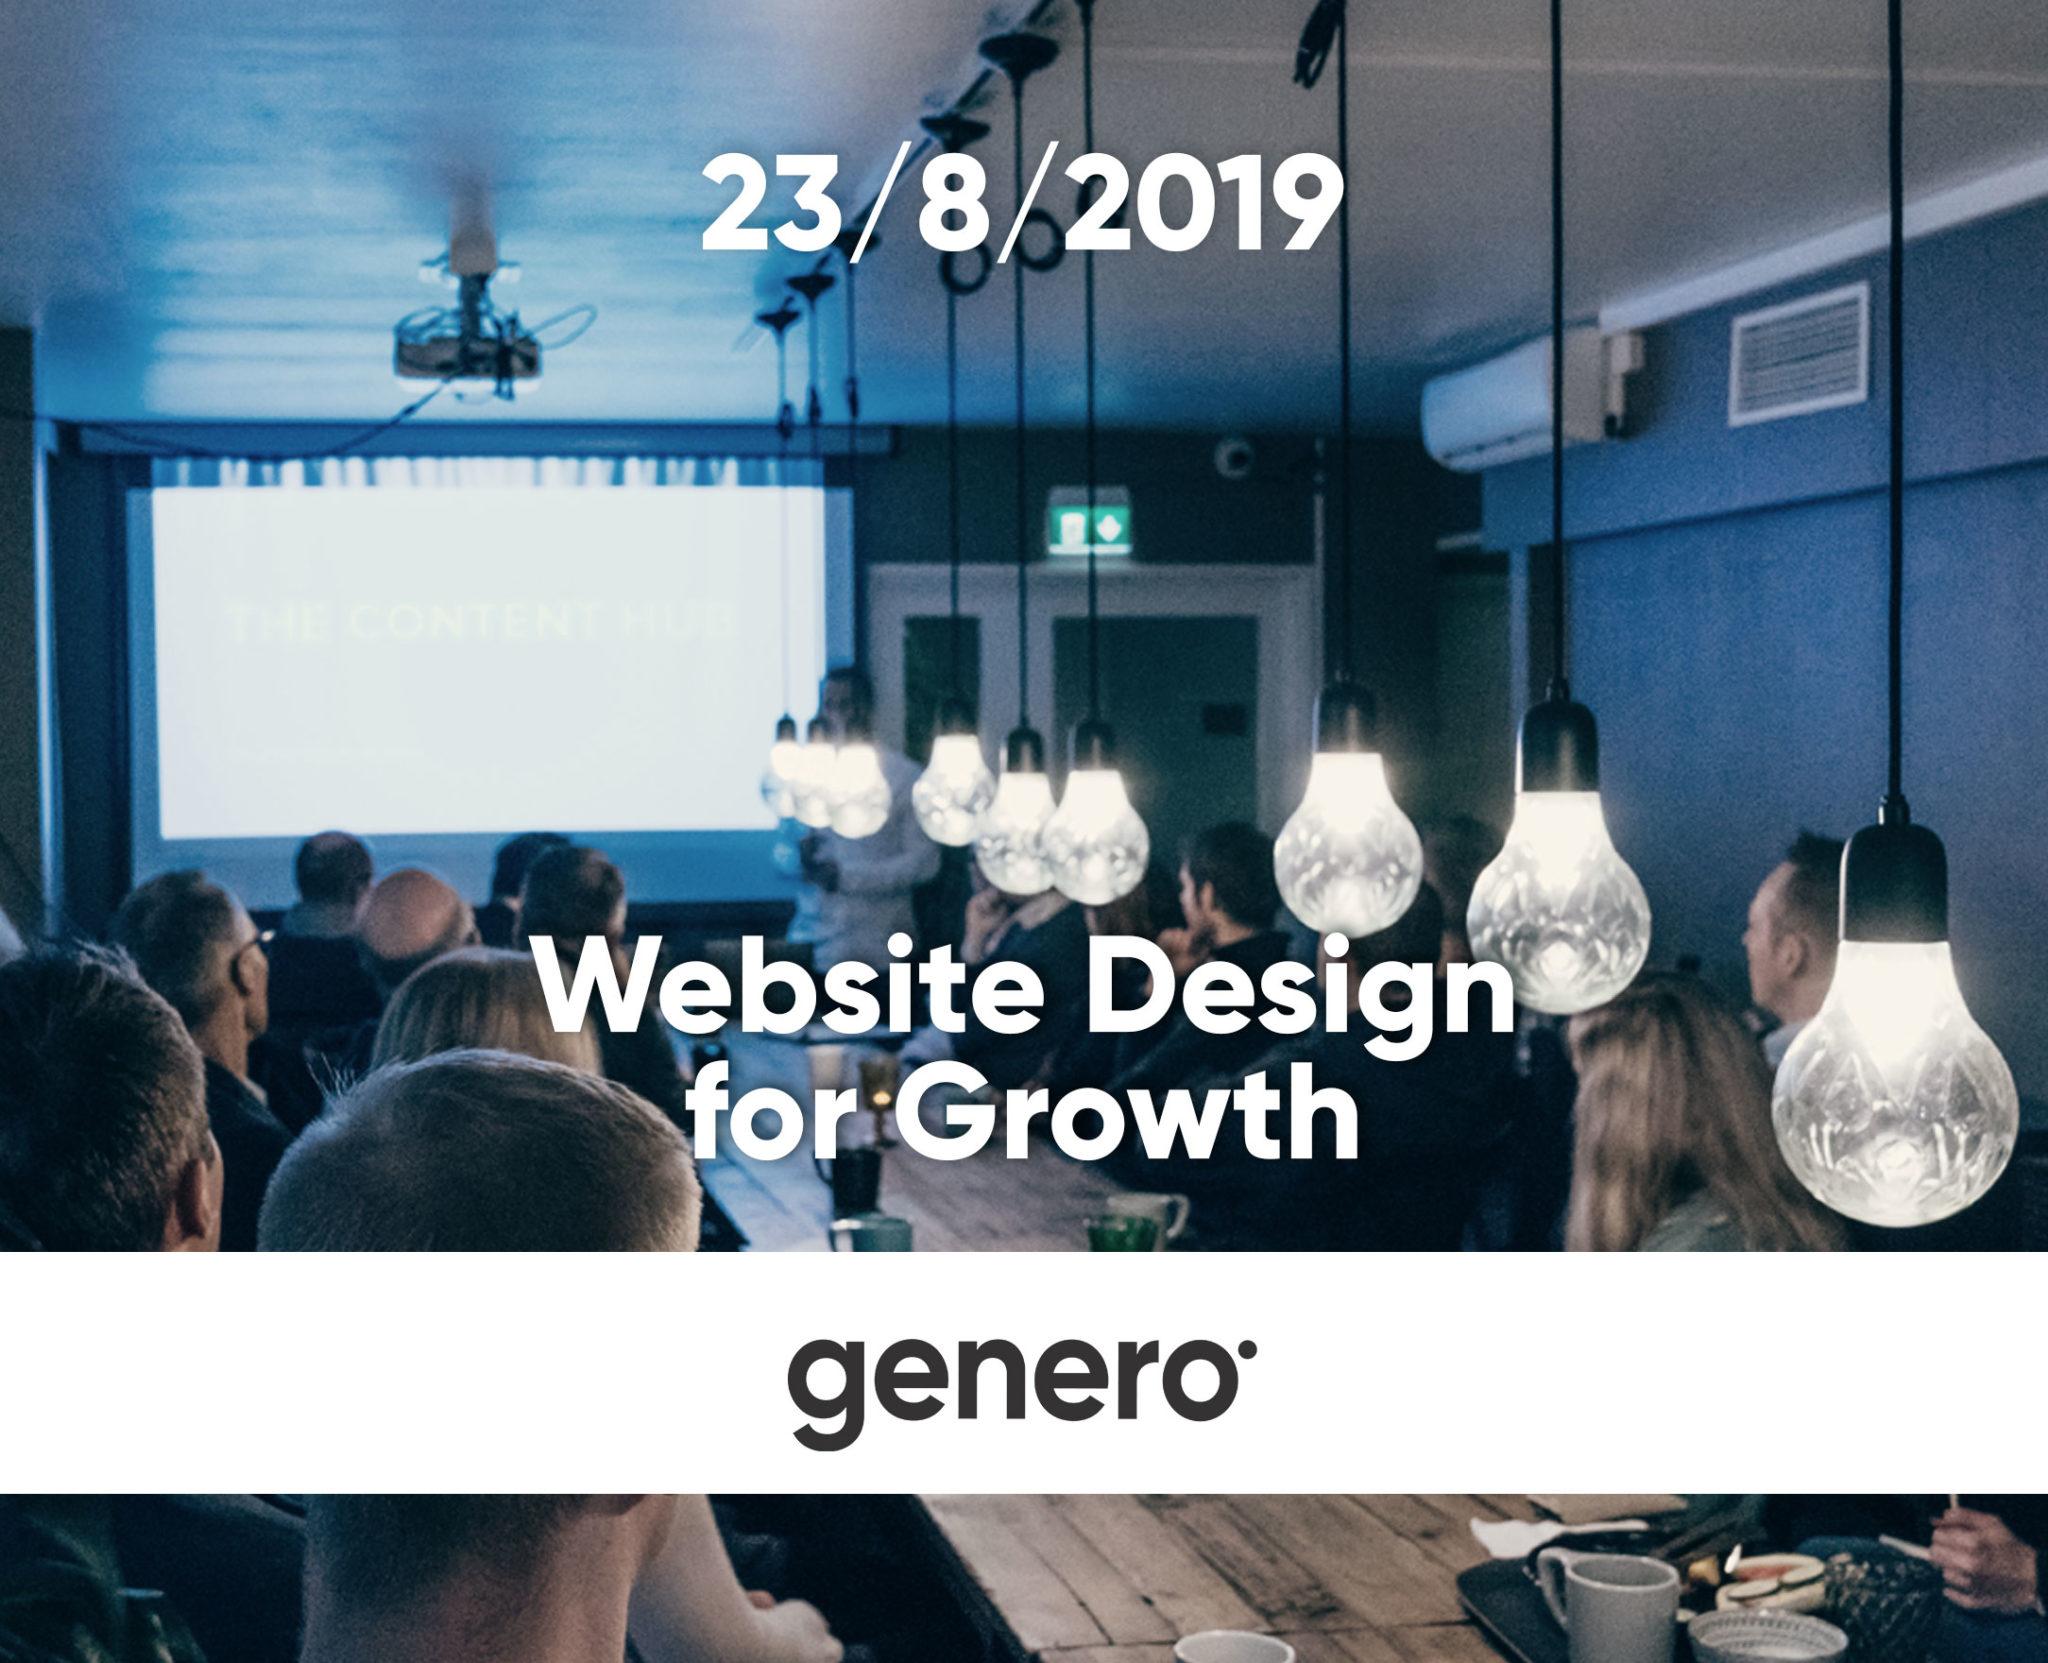 Genero Growth Marketing Breakfast: WEBSITE DESIGN FOR GROWTH 23.8.